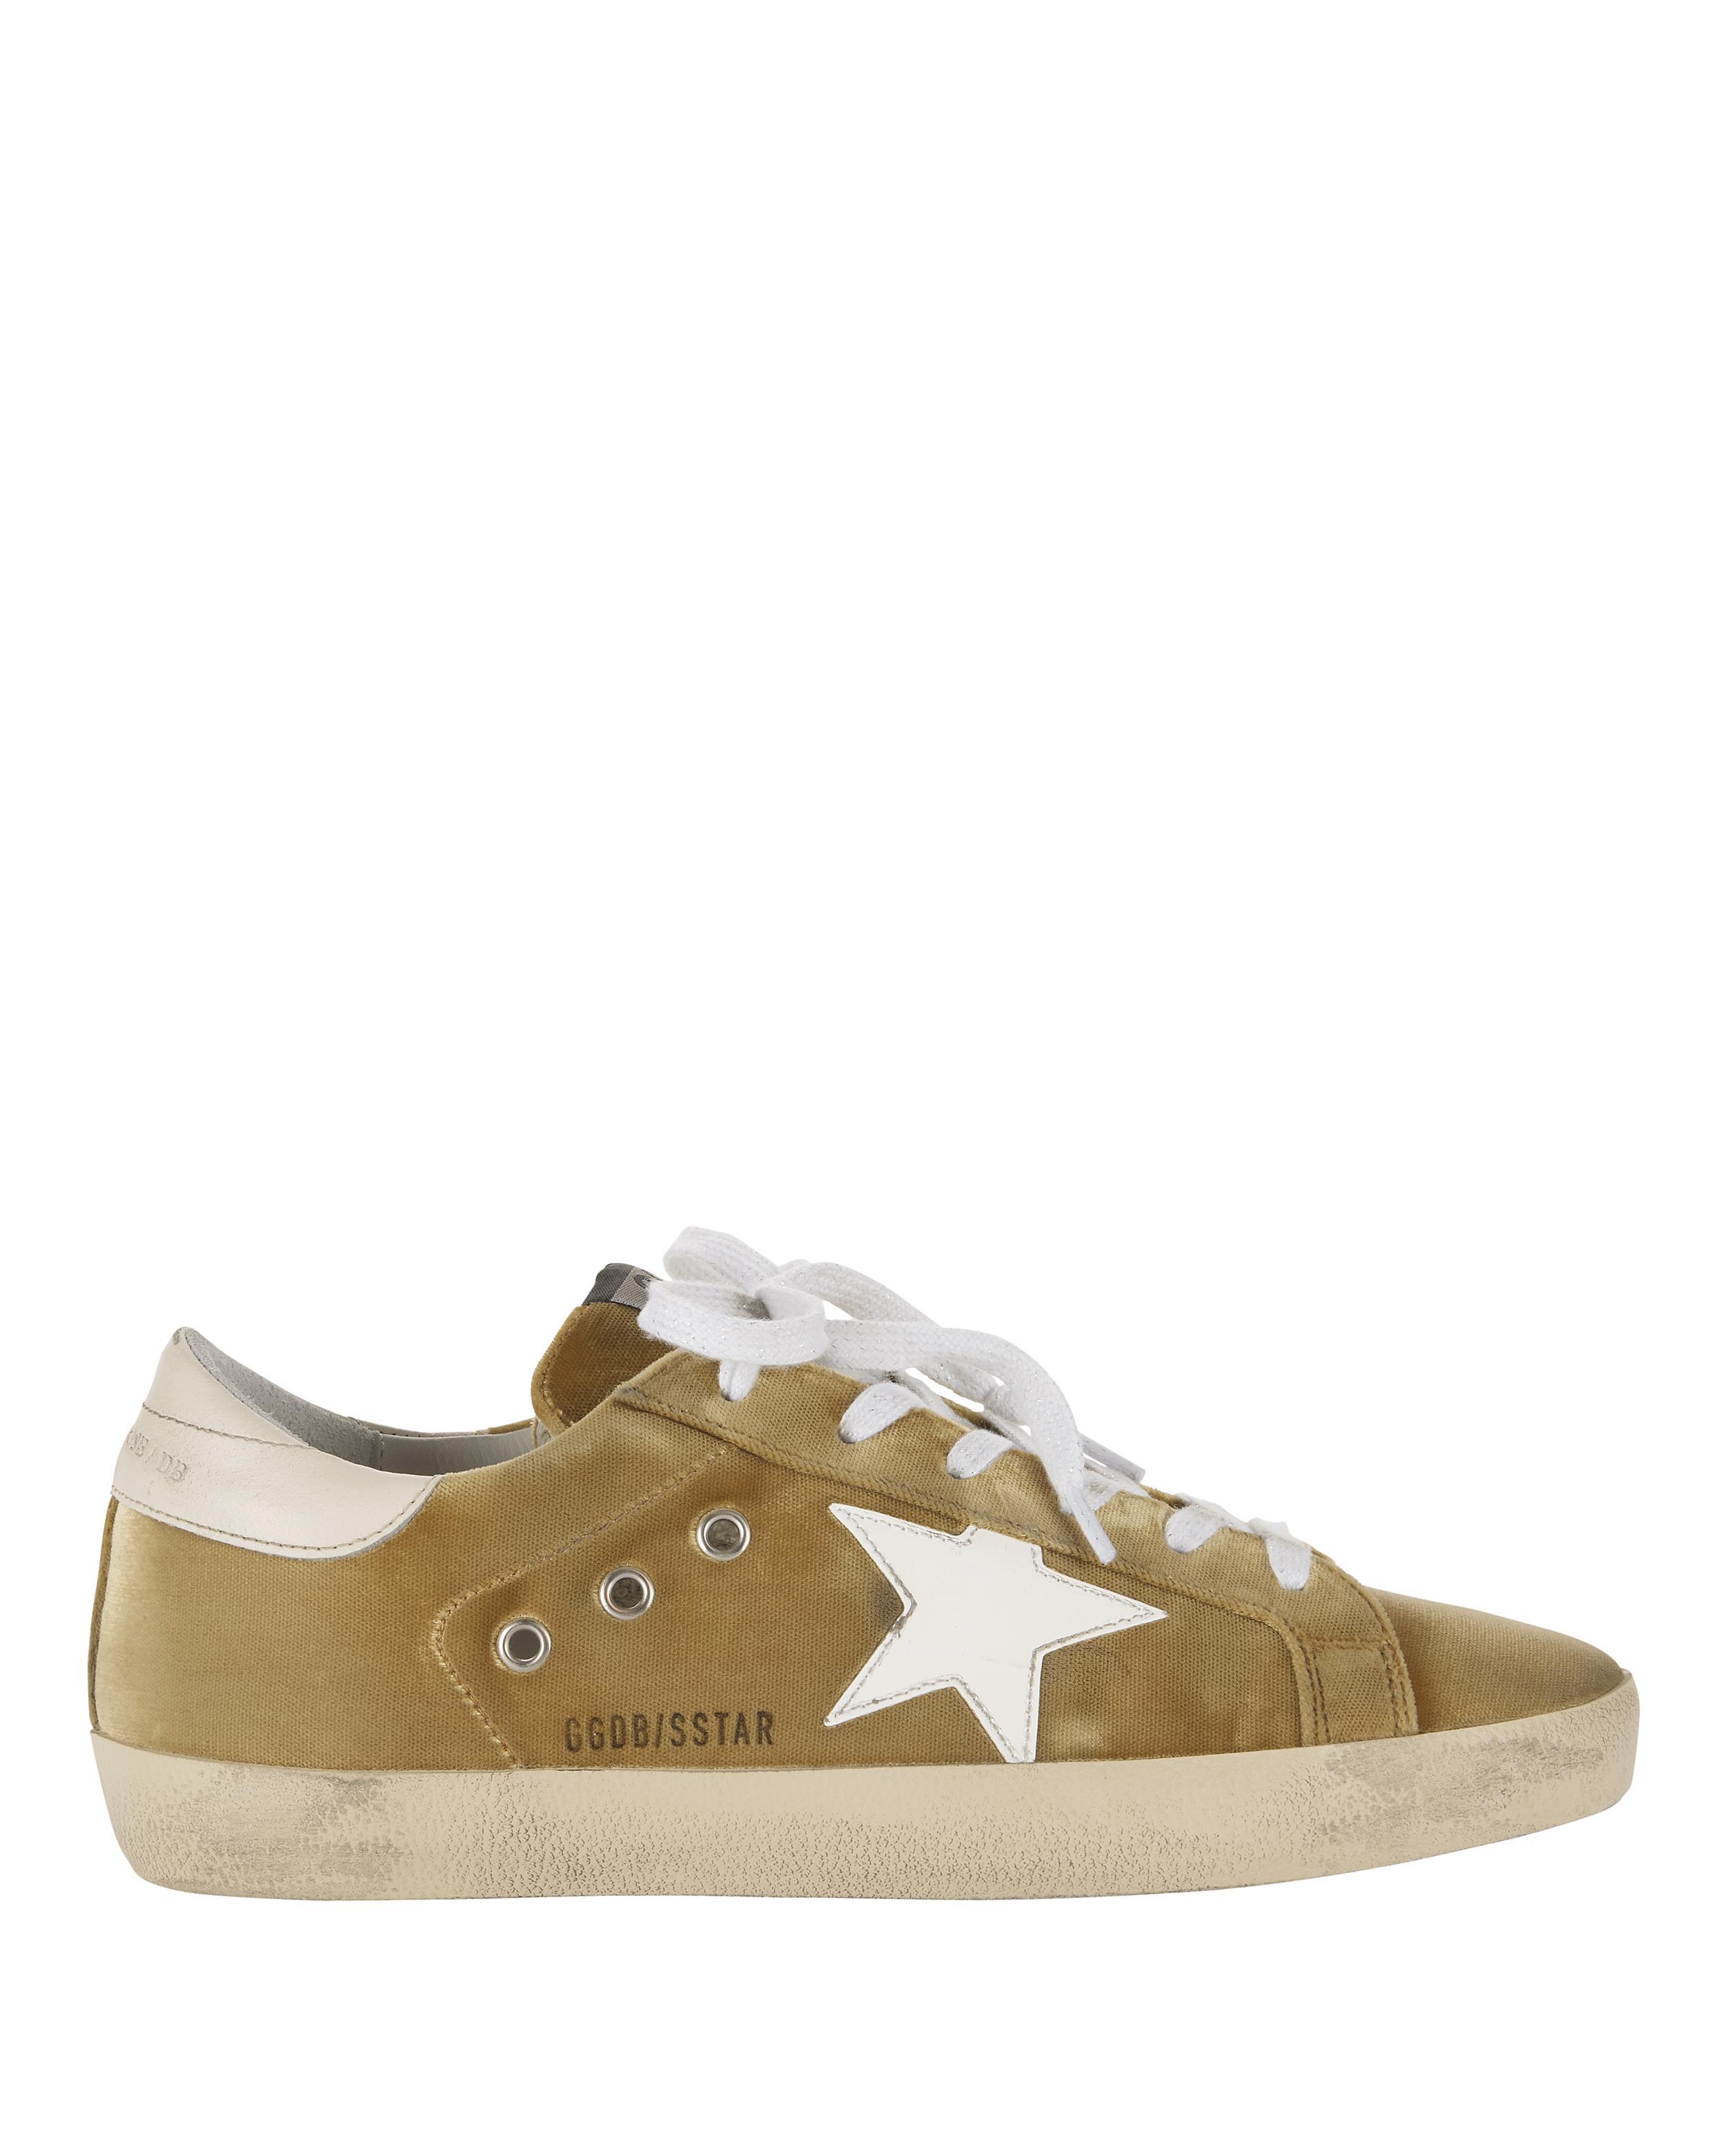 En Venta Finishline Golden Goose Deluxe Brand Superstar contrast sneakers - Brown Sast Salida 2018 Nueva Línea 29tM9